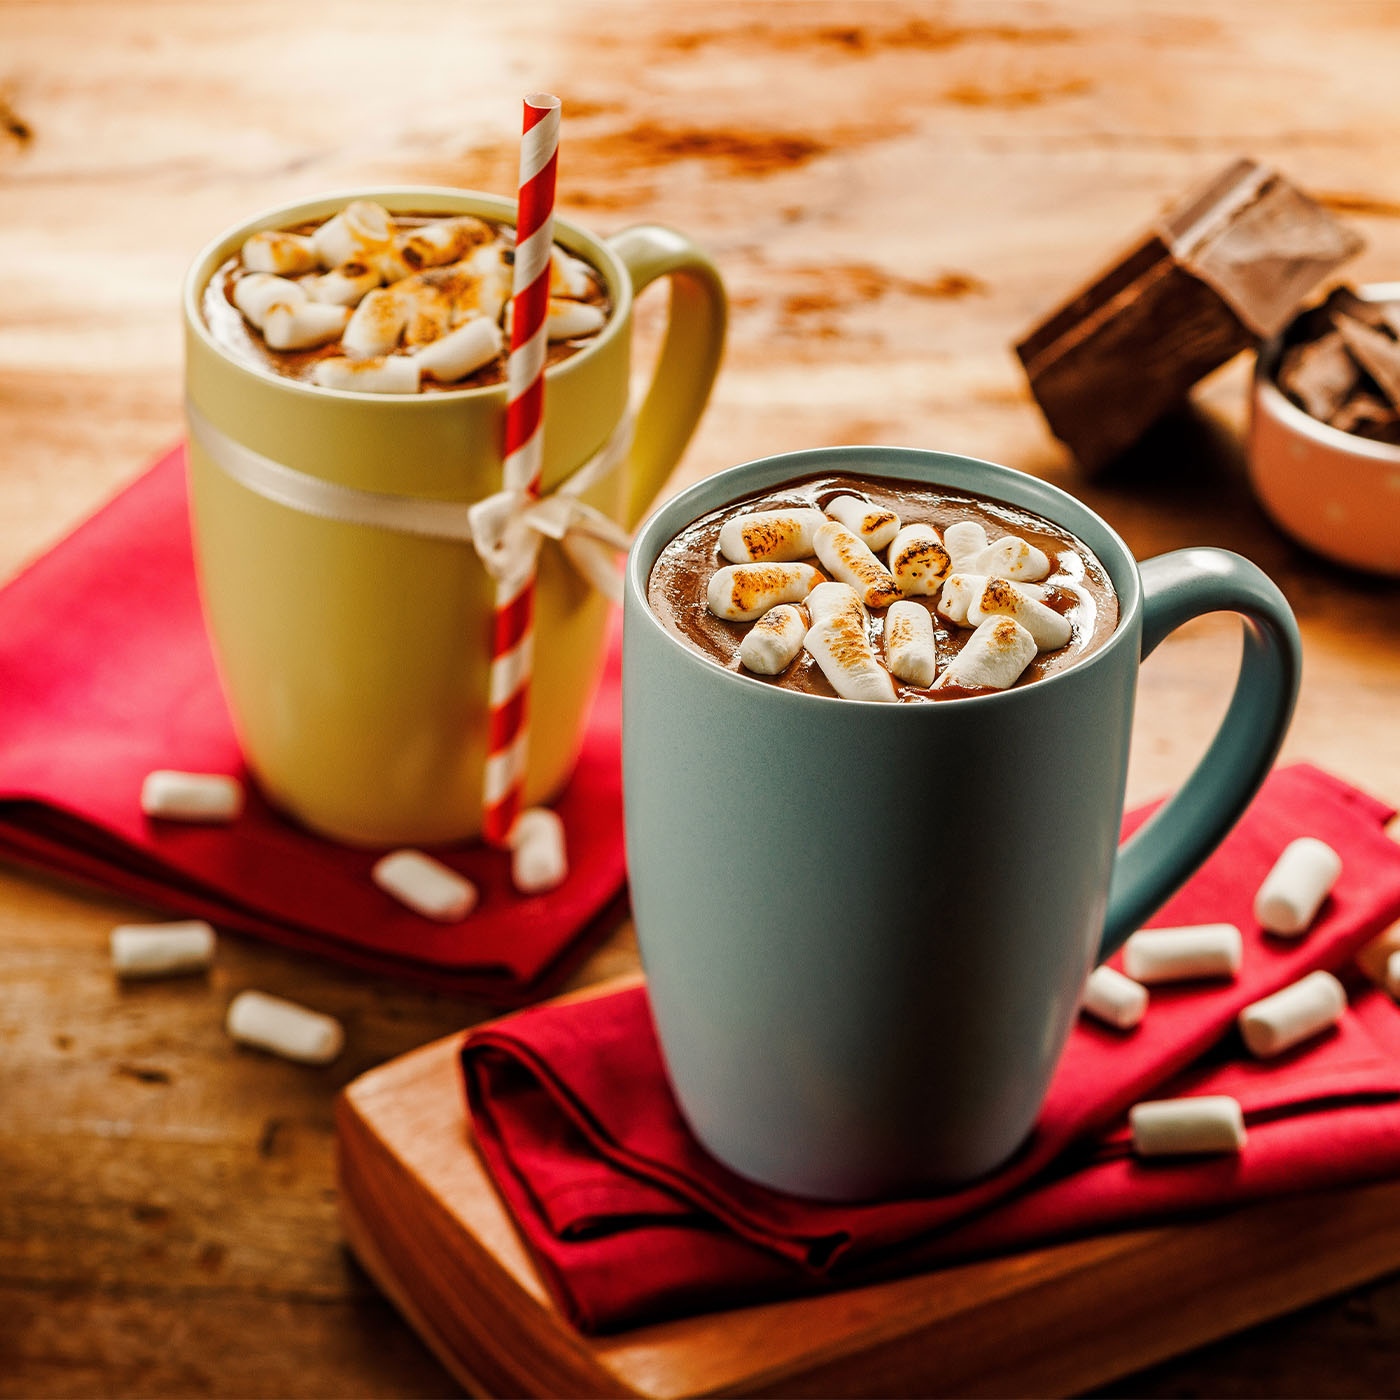 Chocolate Quente Cremoso com Marshmallow